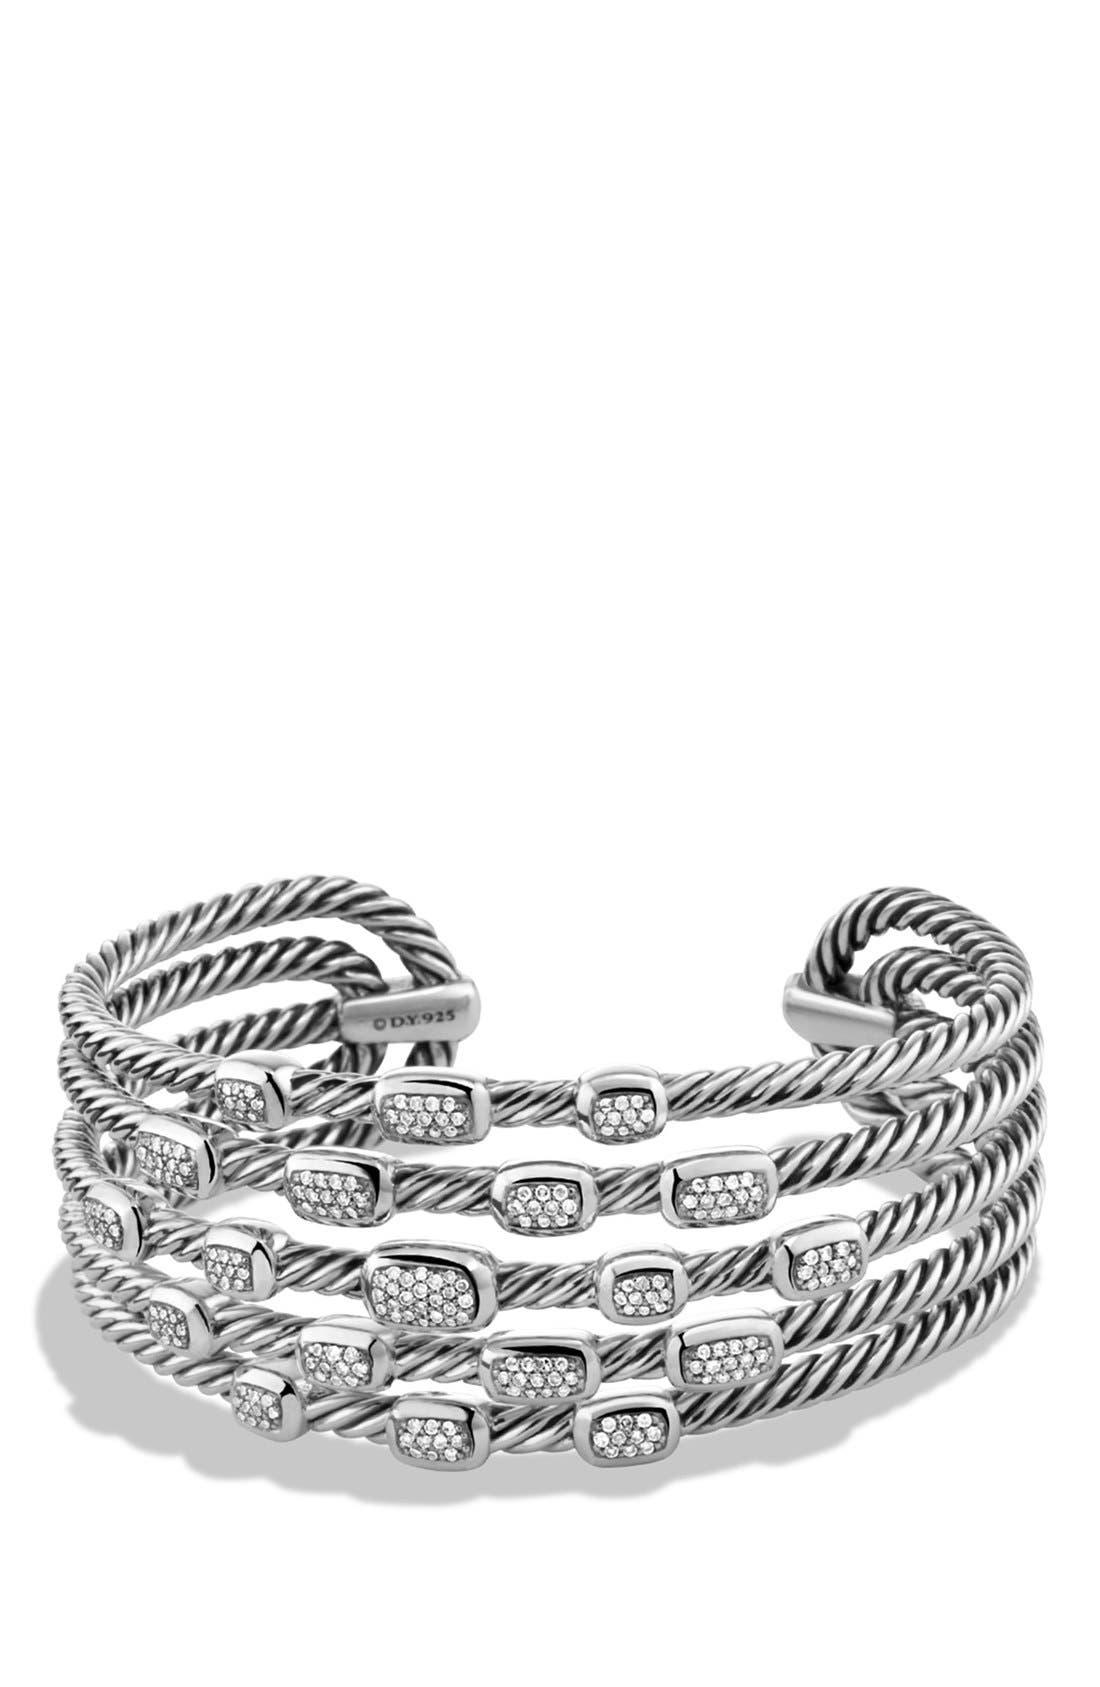 David Yurman 'Confetti' Wide Cuff Bracelet with Diamonds